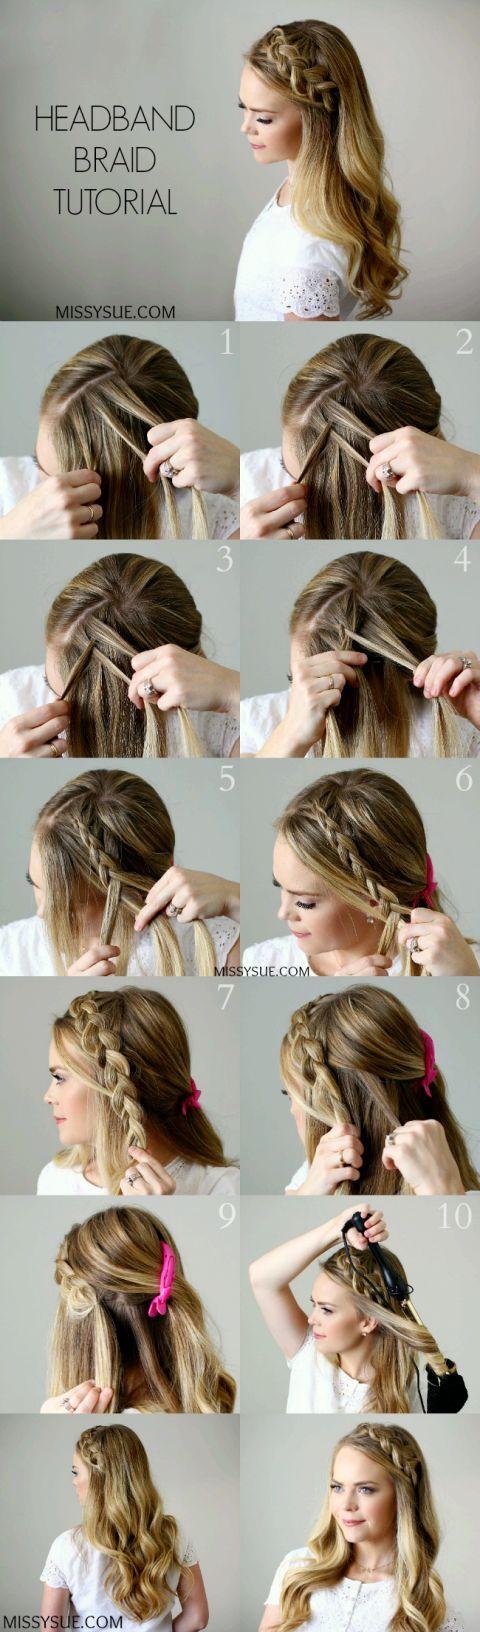 long hair model – Stirnbandgeflecht – Style Like Pro